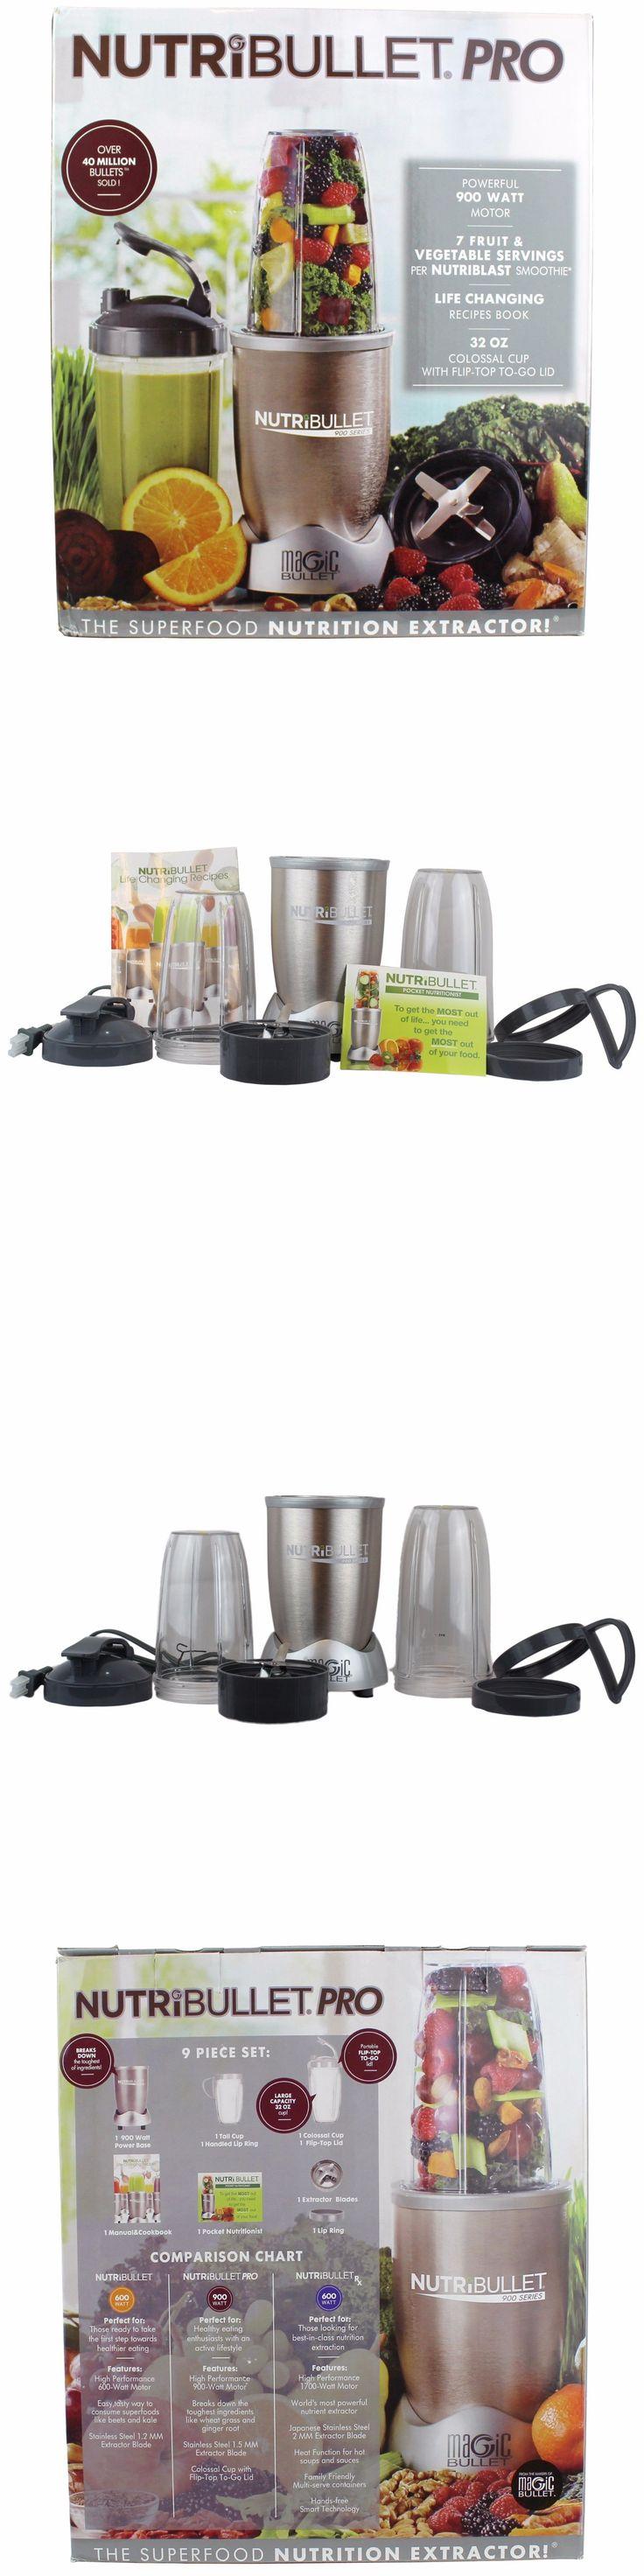 Small Kitchen Appliances: Nutribullet 9 Piece Pro 900 Hi-Speed Blender Mixer Set Nb9-0901 -> BUY IT NOW ONLY: $75.99 on eBay!